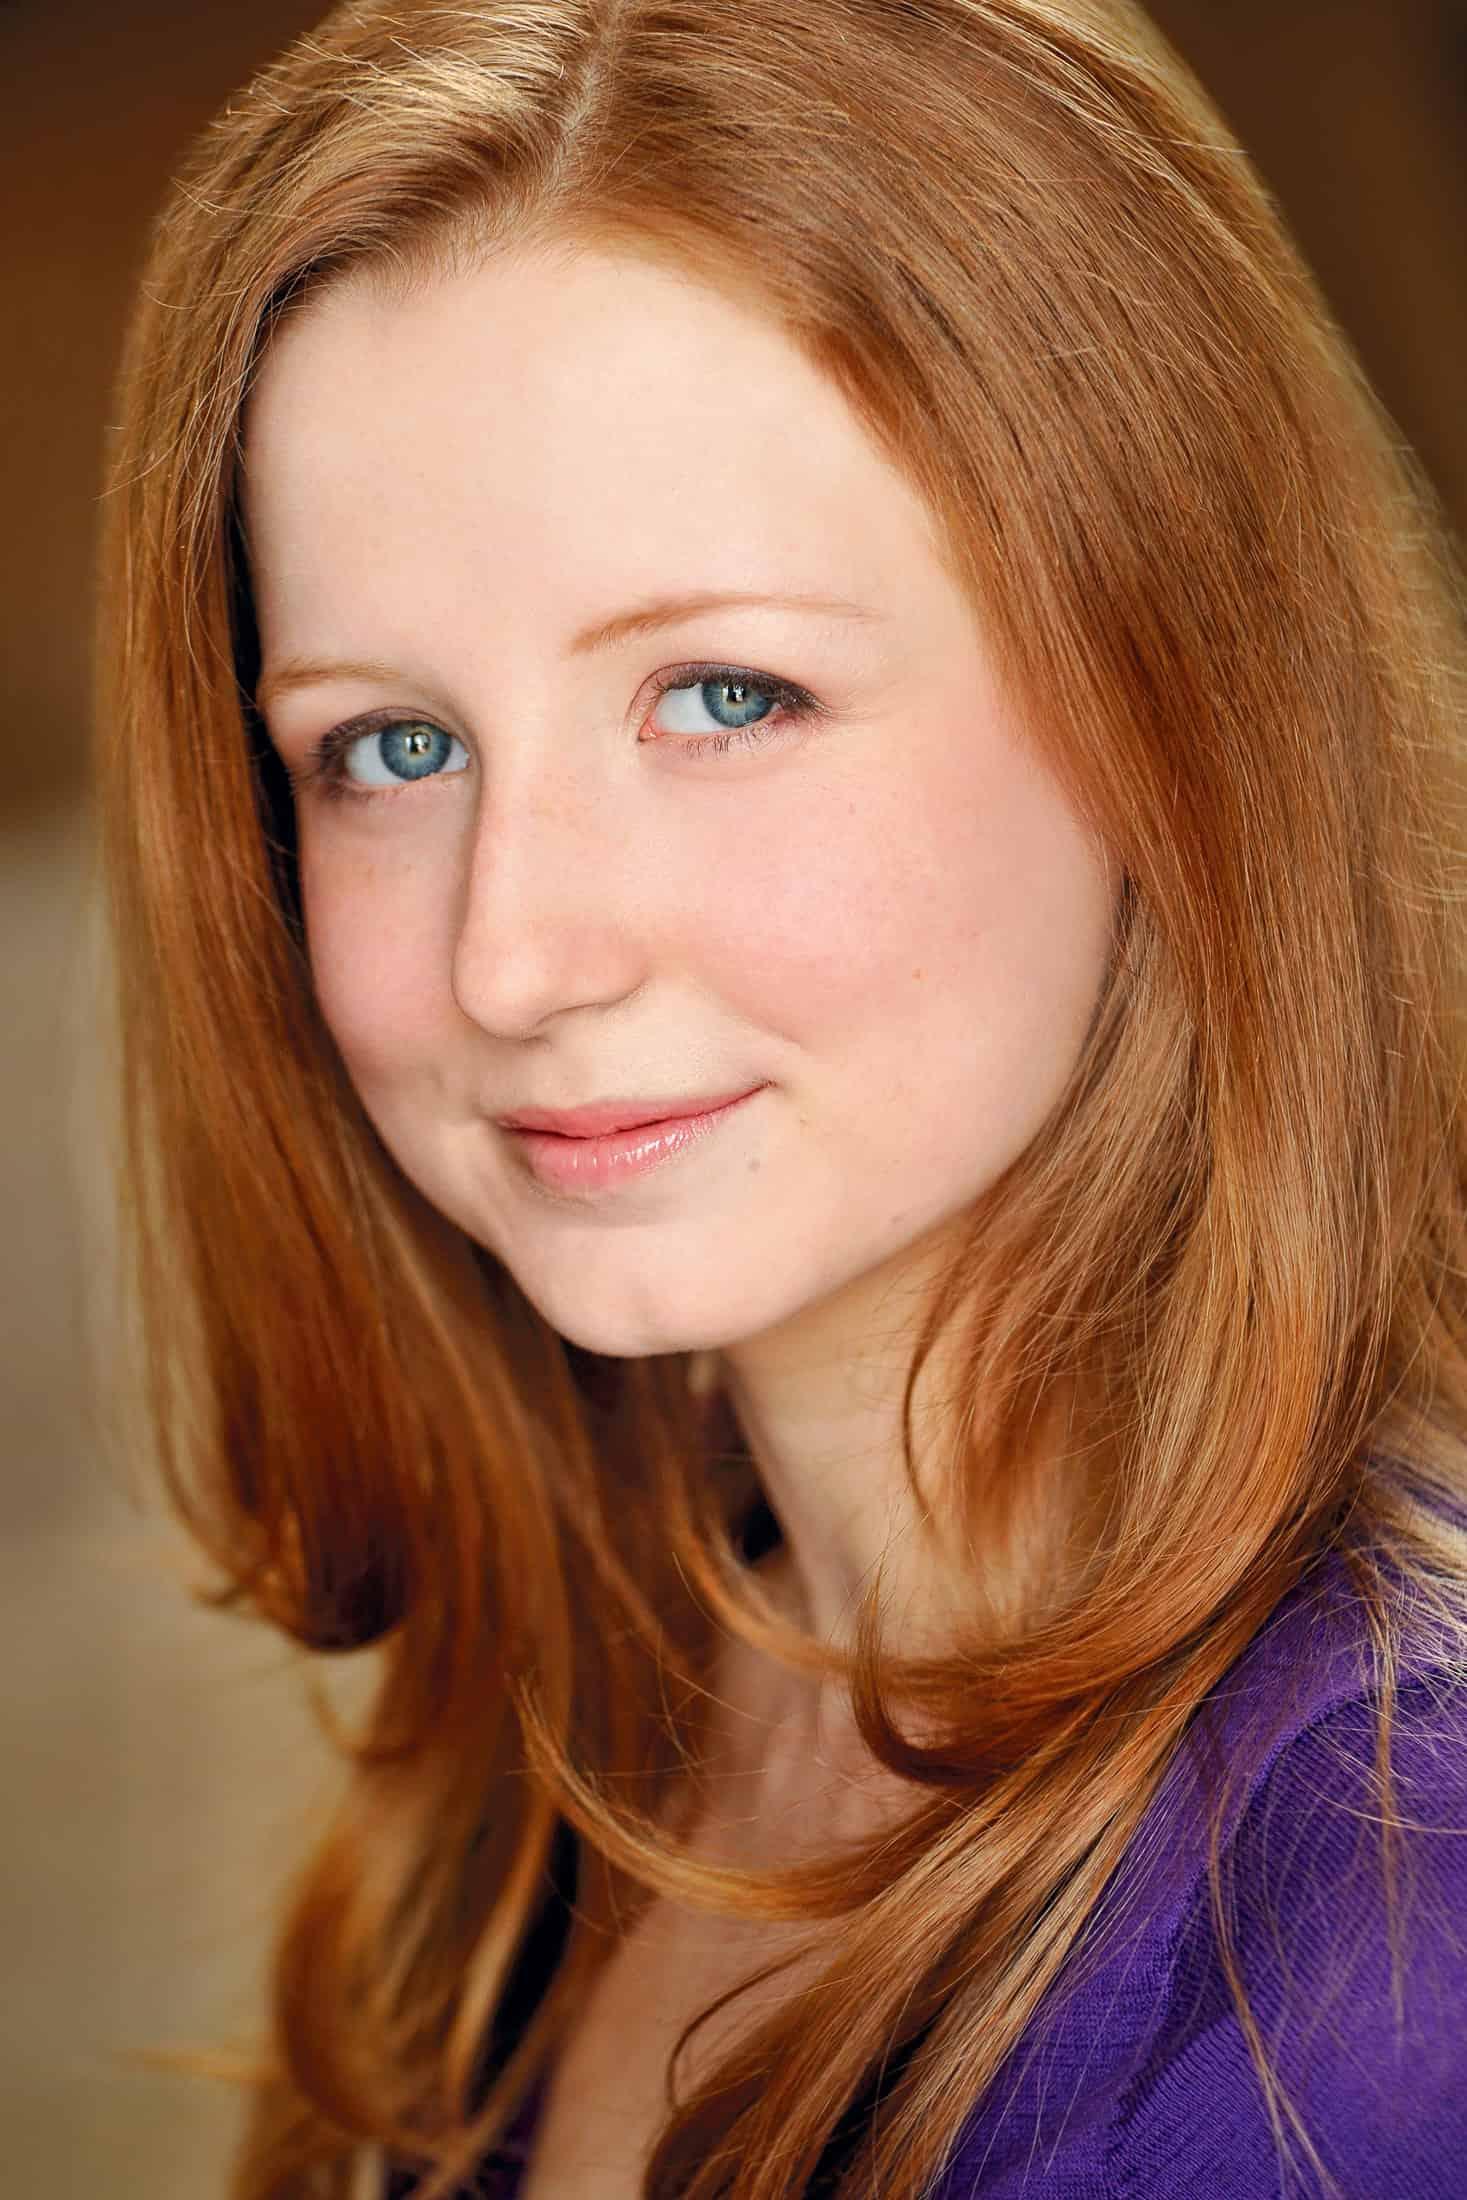 Headshots NYC - Actor Headshots Kate G